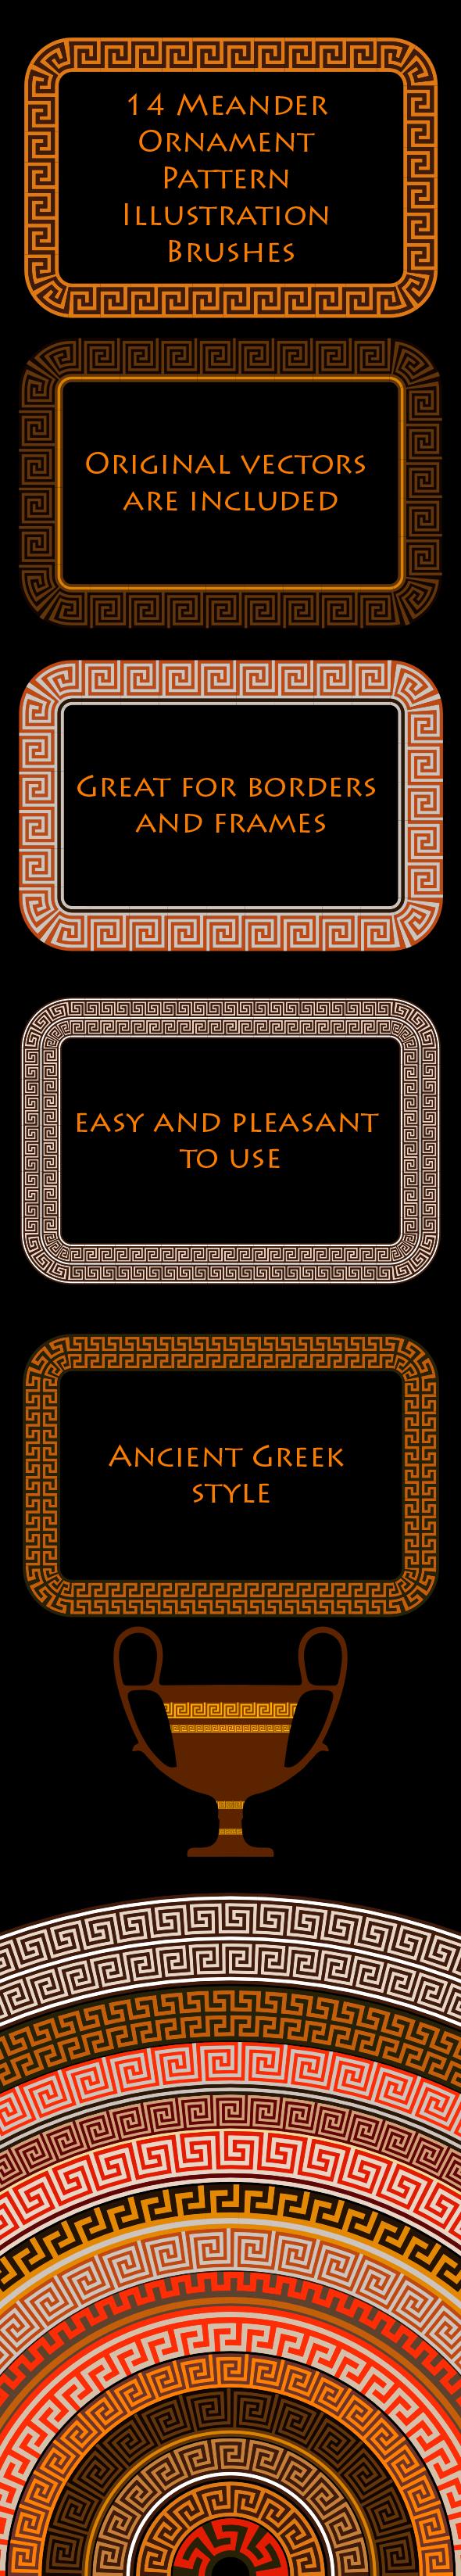 Meander Ornament -  Ancient Greek Motive Adobe Illustrator Brushes - Miscellaneous Brushes